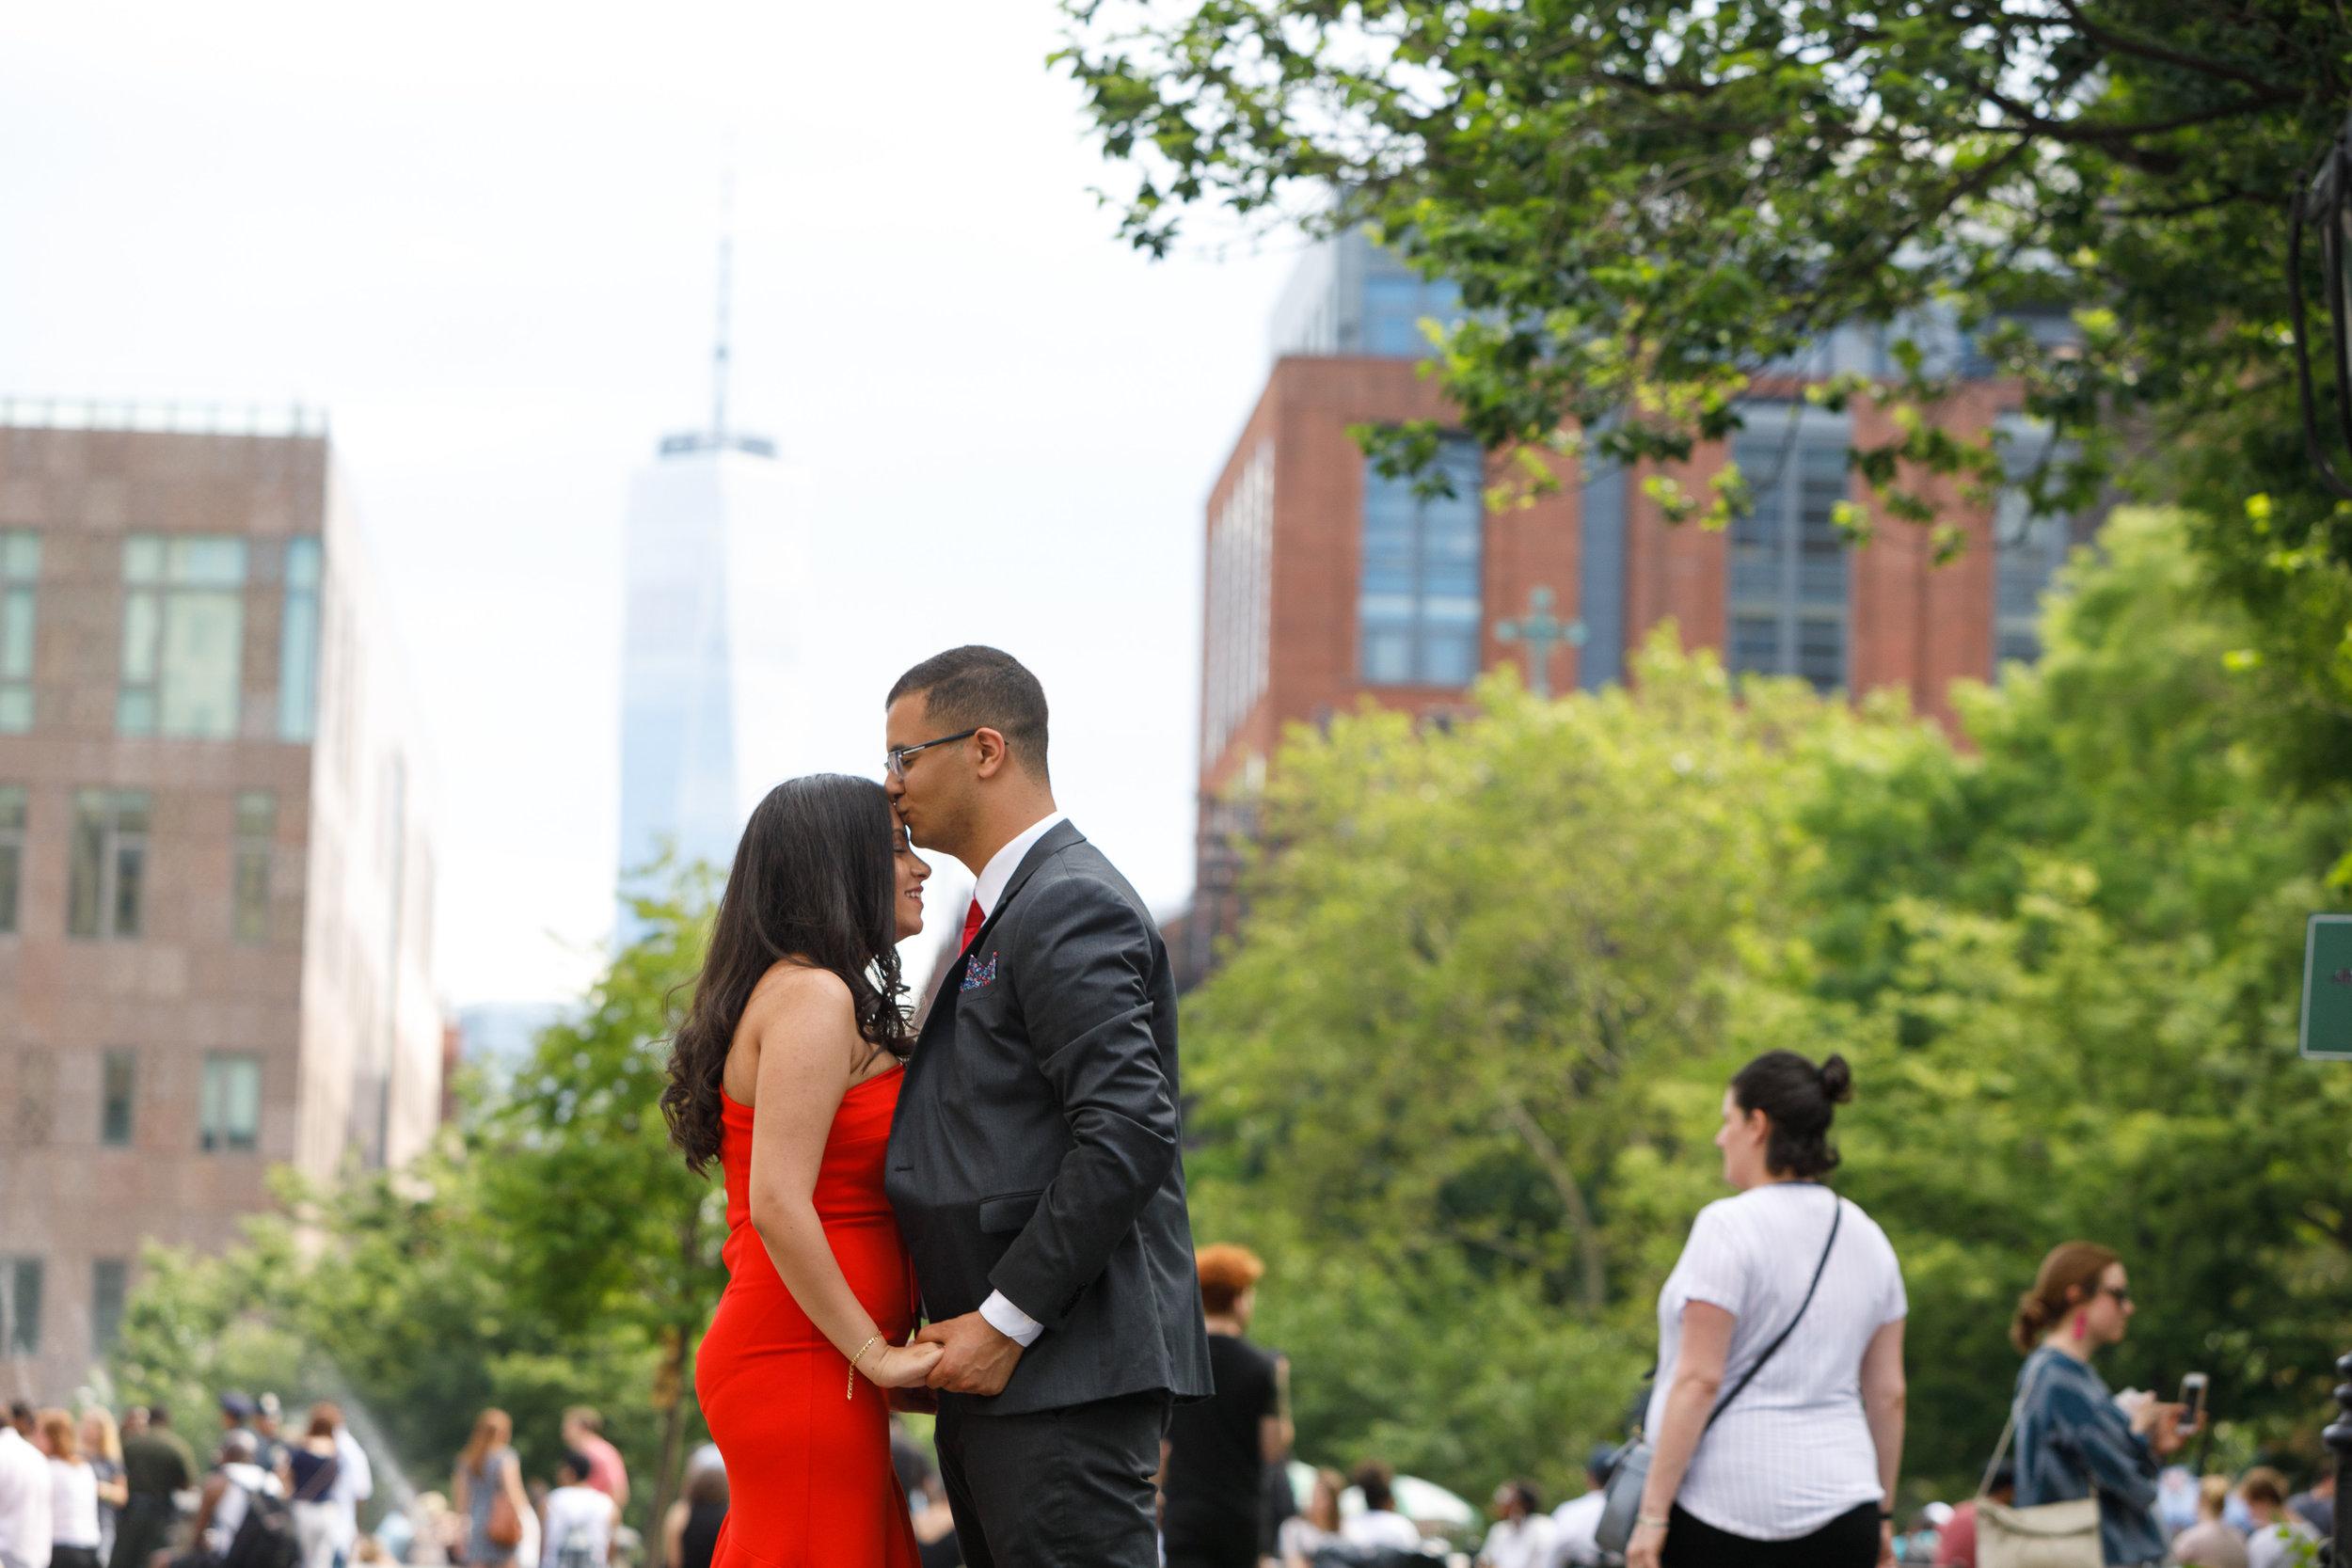 Kiro Rebecca Washington Square Park Marriage Proposal _ Jonathan Heisler _ 6152019 _037.jpg